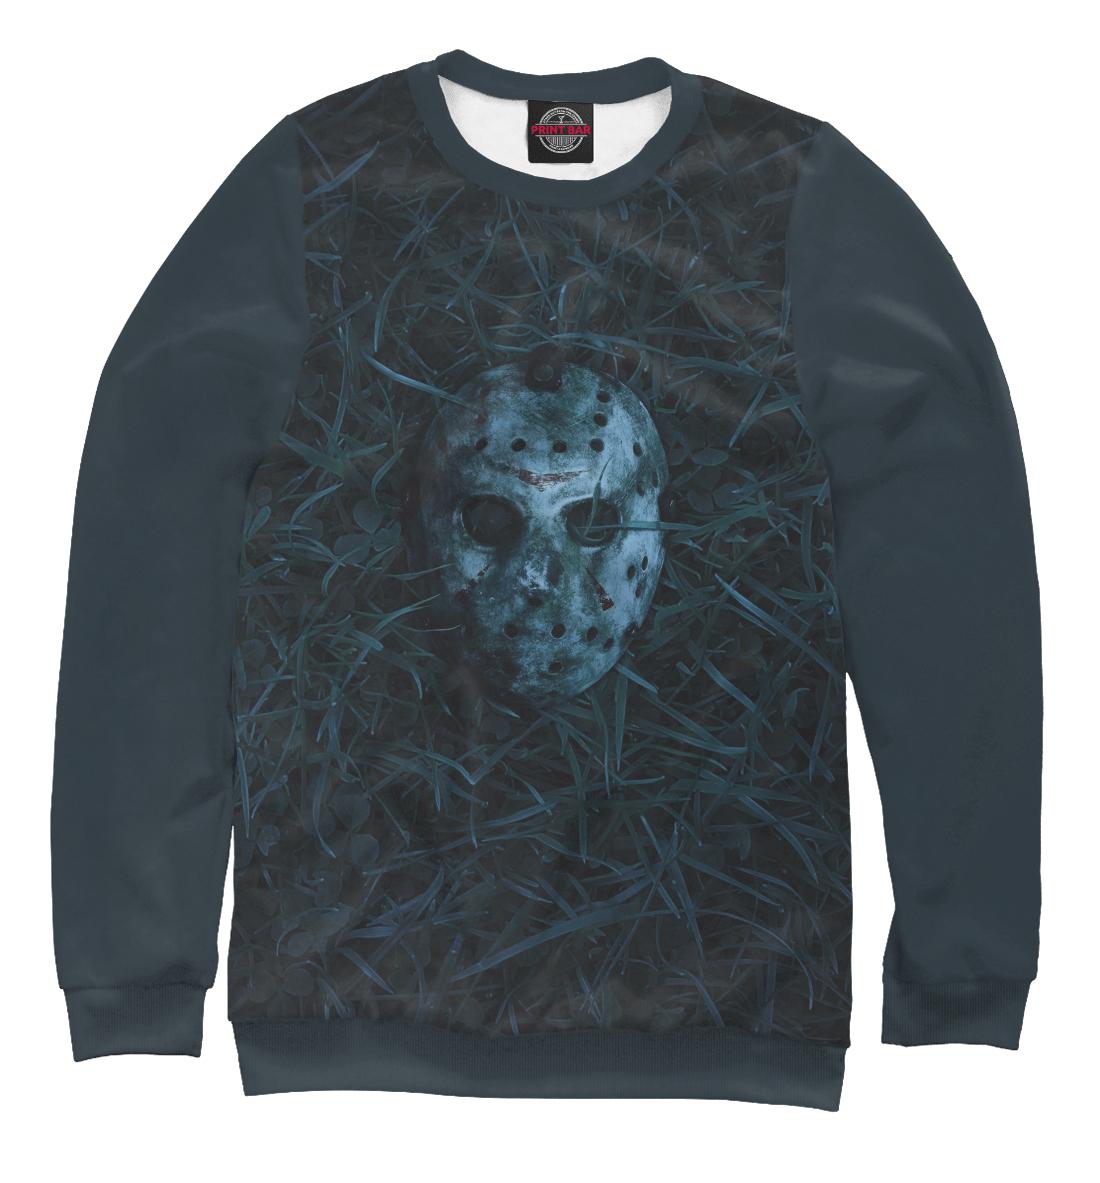 Купить Friday the 13th, Printbar, Свитшоты, HOR-101710-swi-2